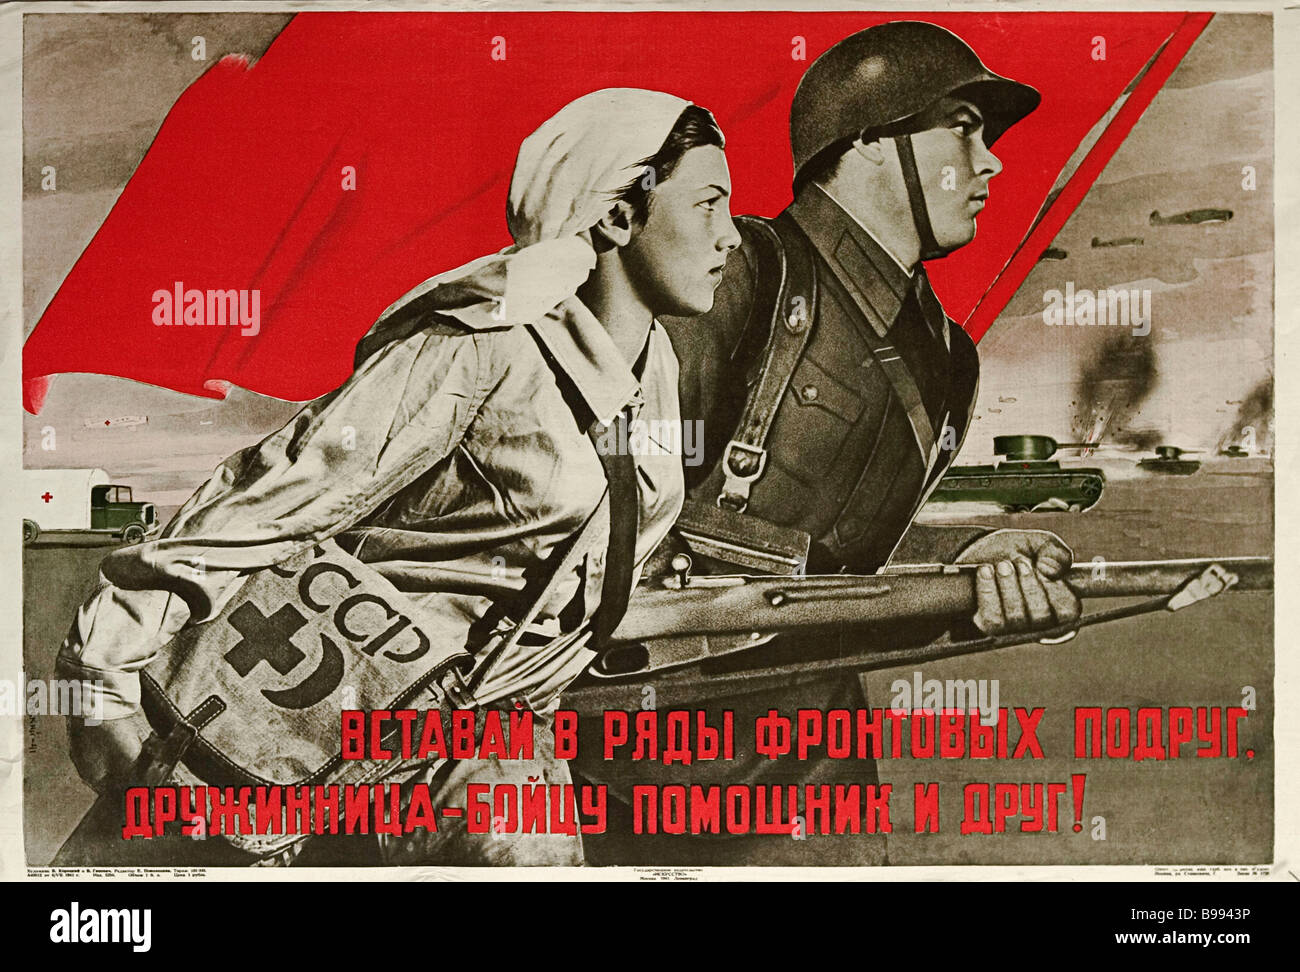 Viktor Koretsky and Vera Gitsevitch Let s join the patrol women brigade 1941 - Stock Image